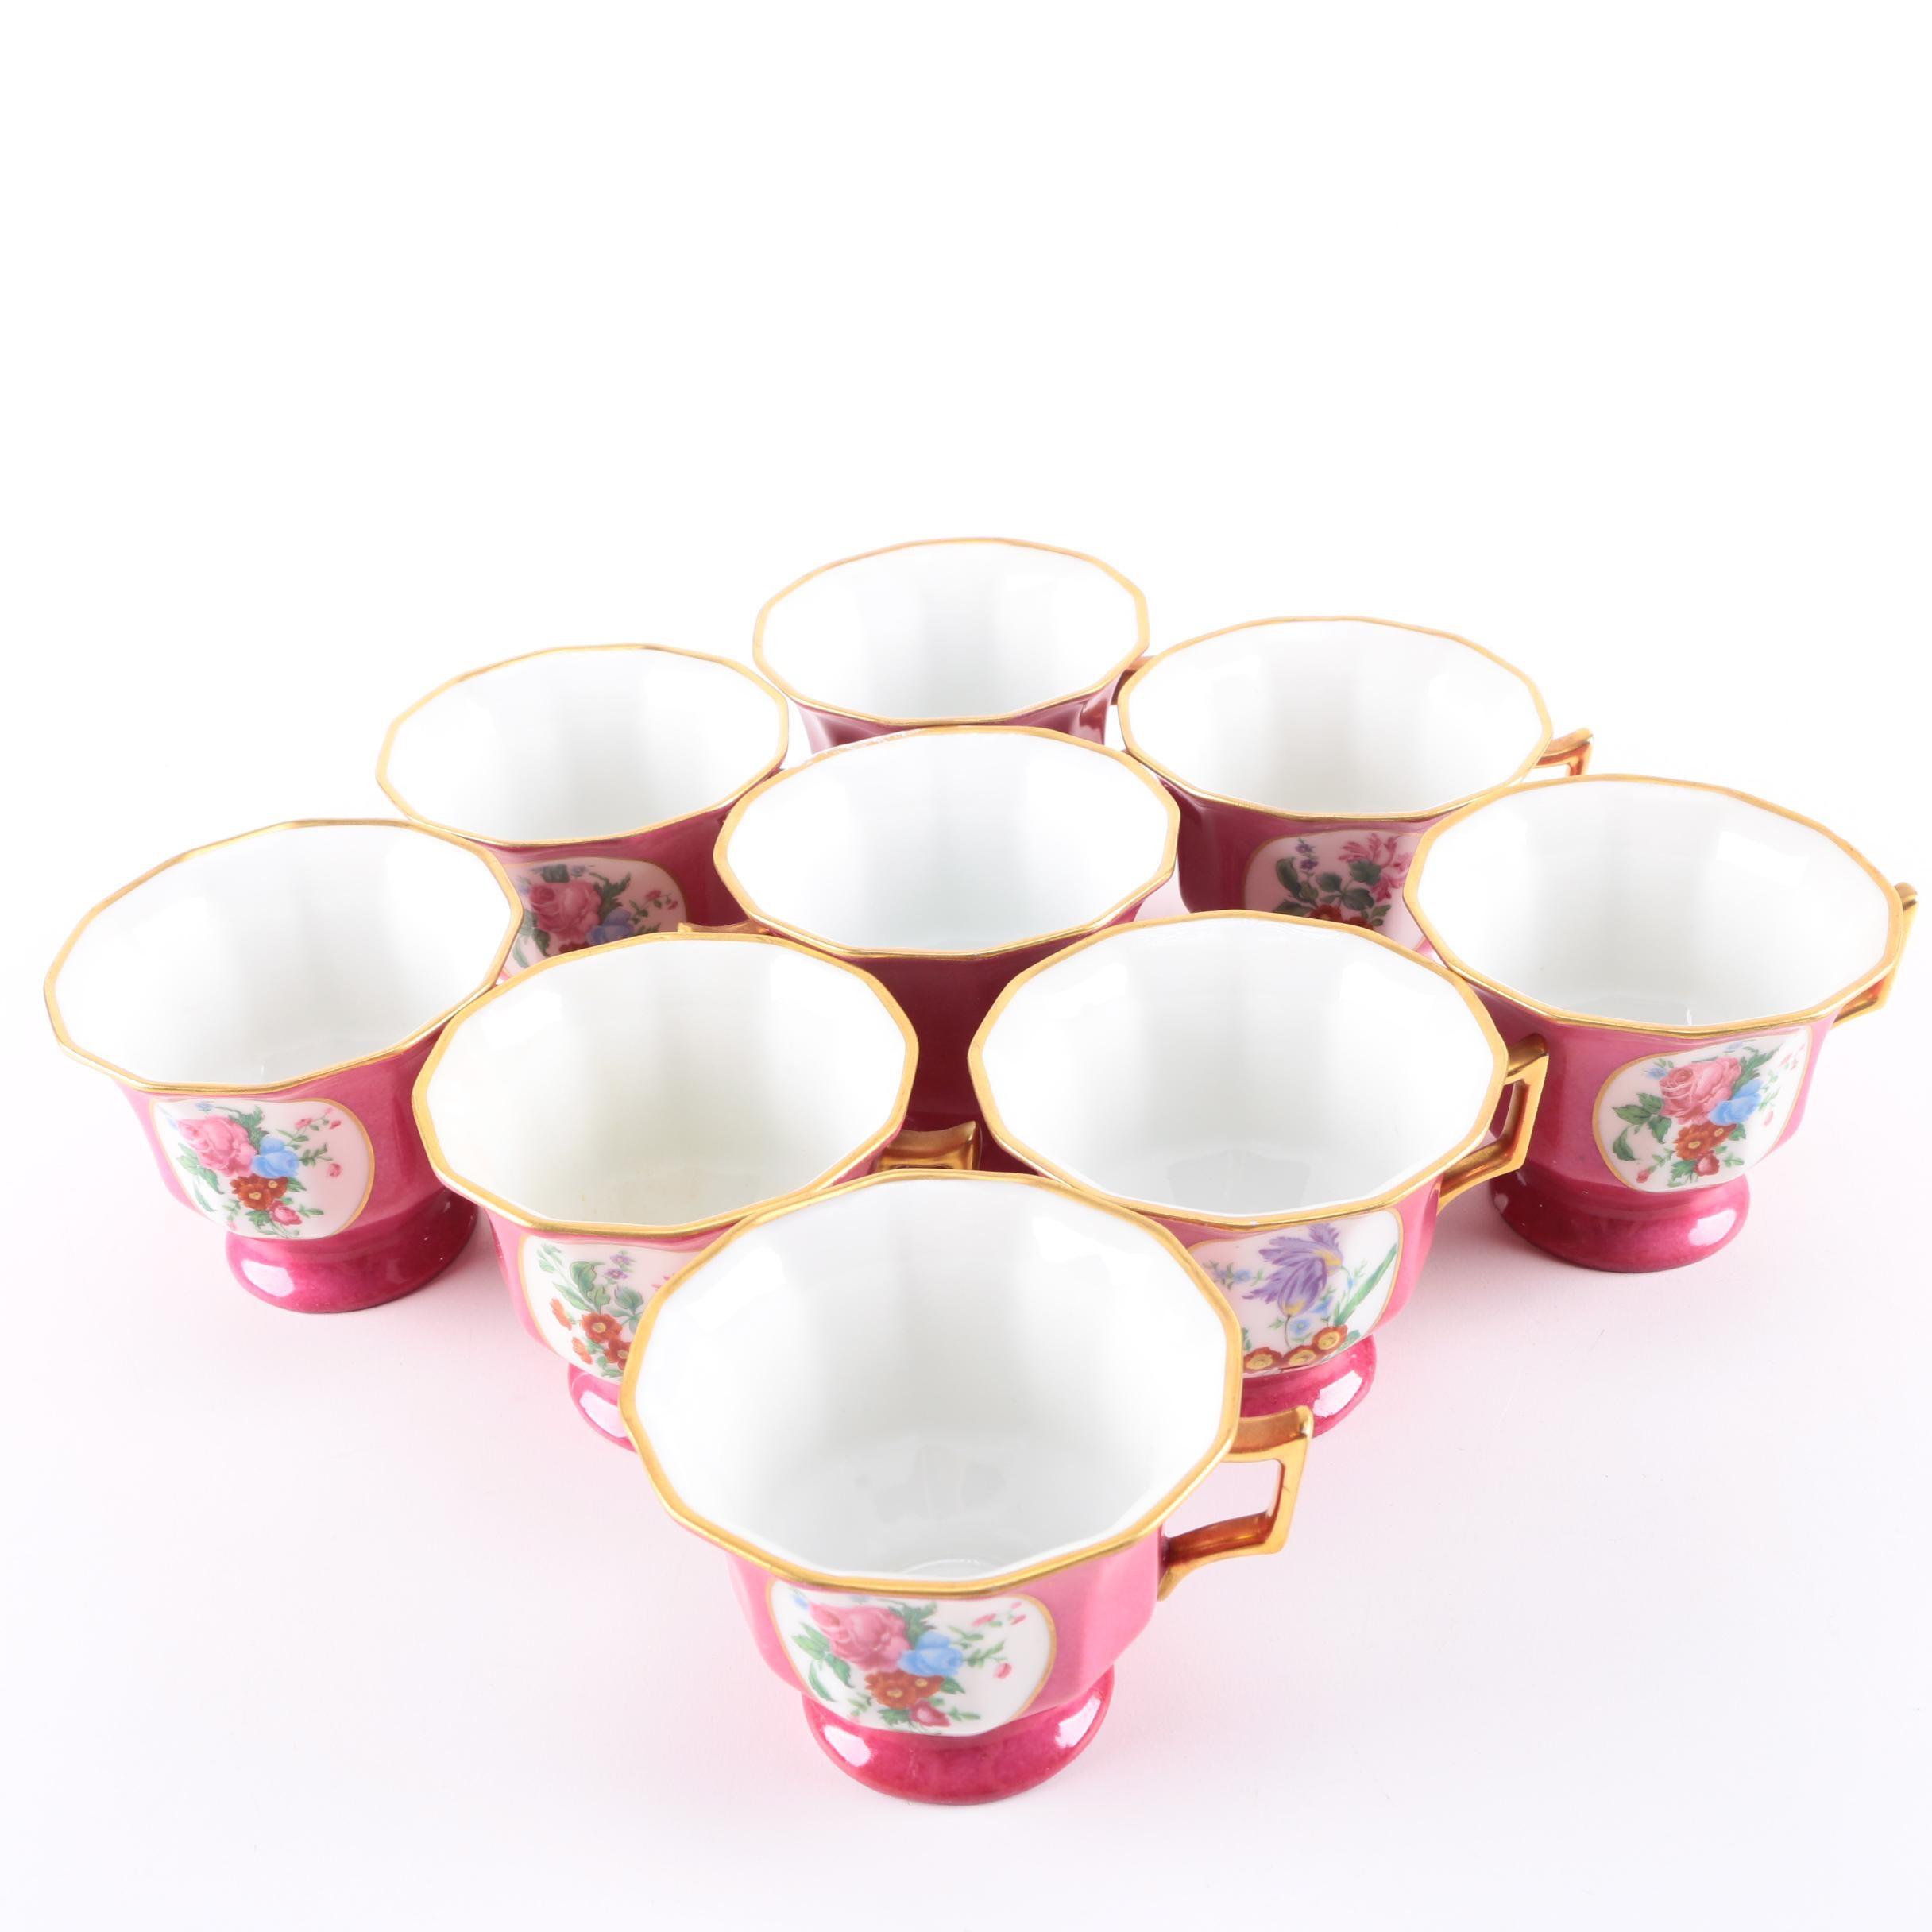 Limoges Teacup Set